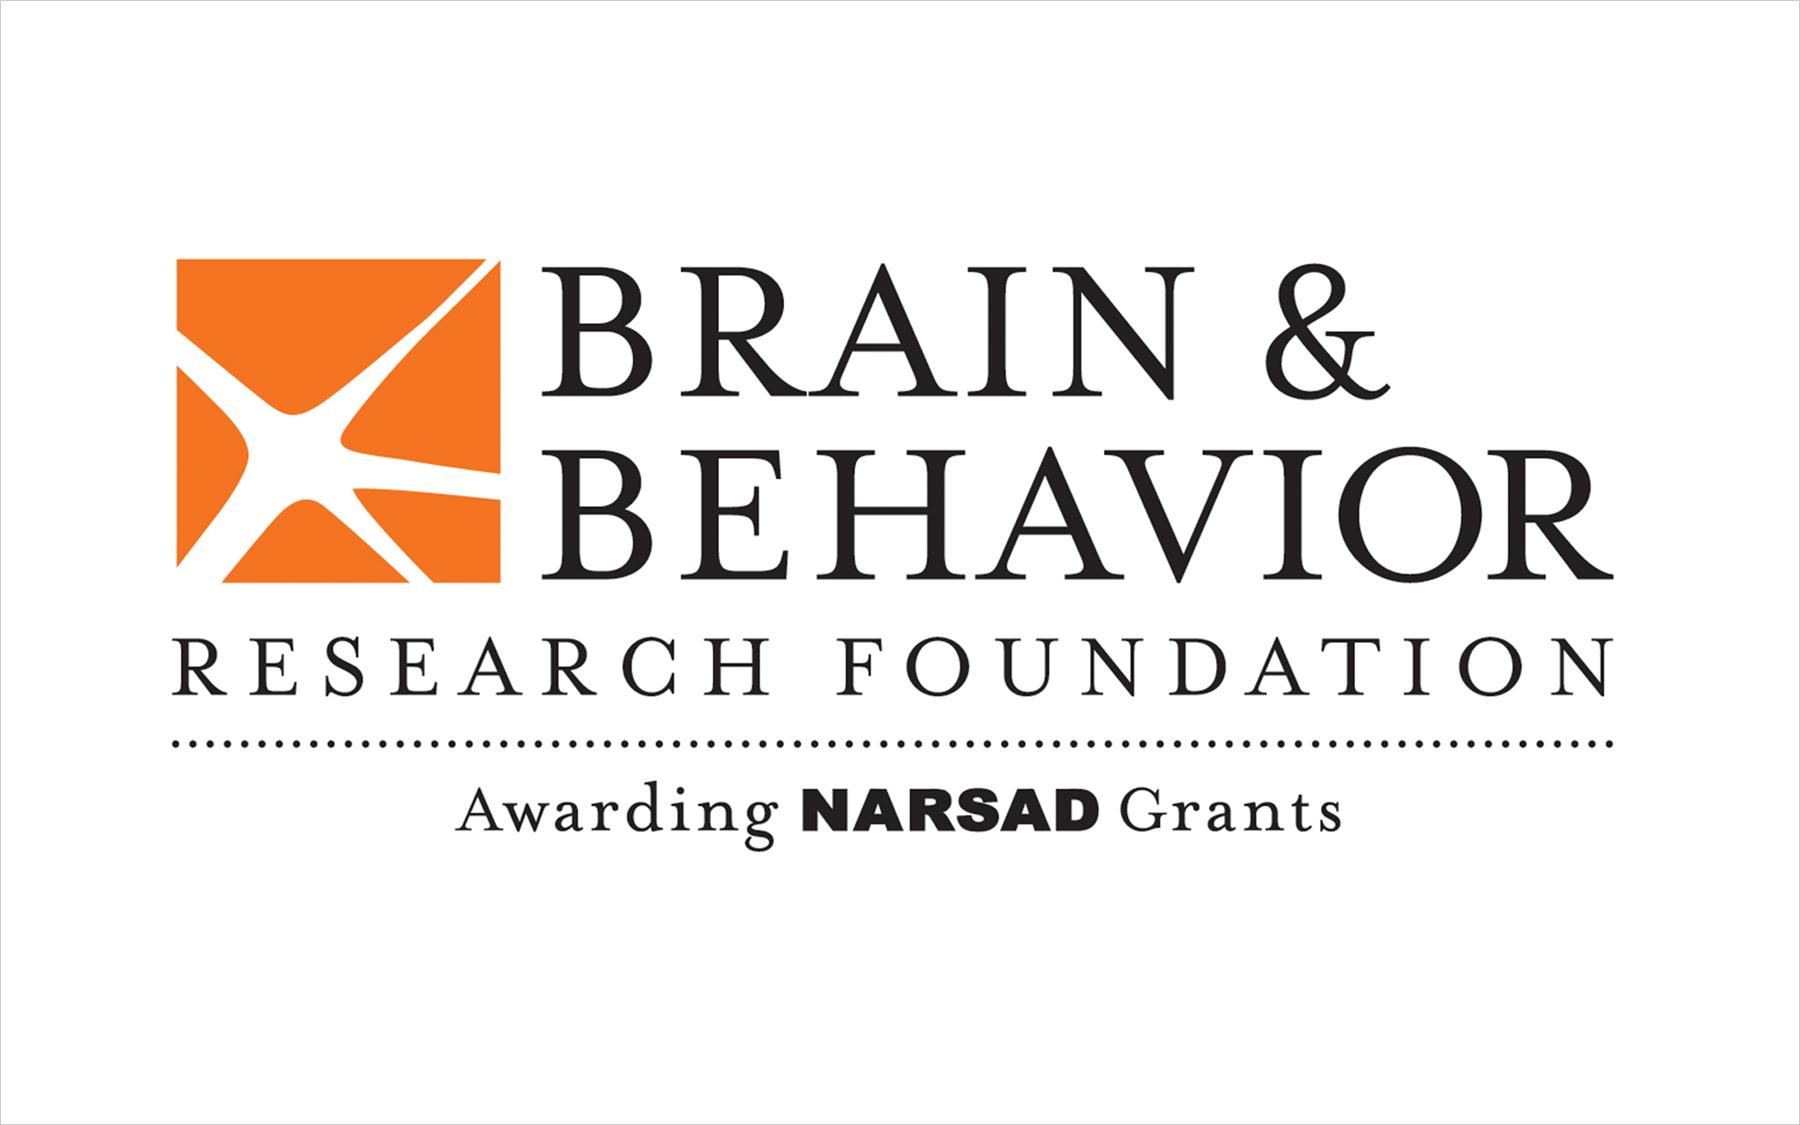 graphic of Brain & Behavior Research Foundation - NARSAD logo